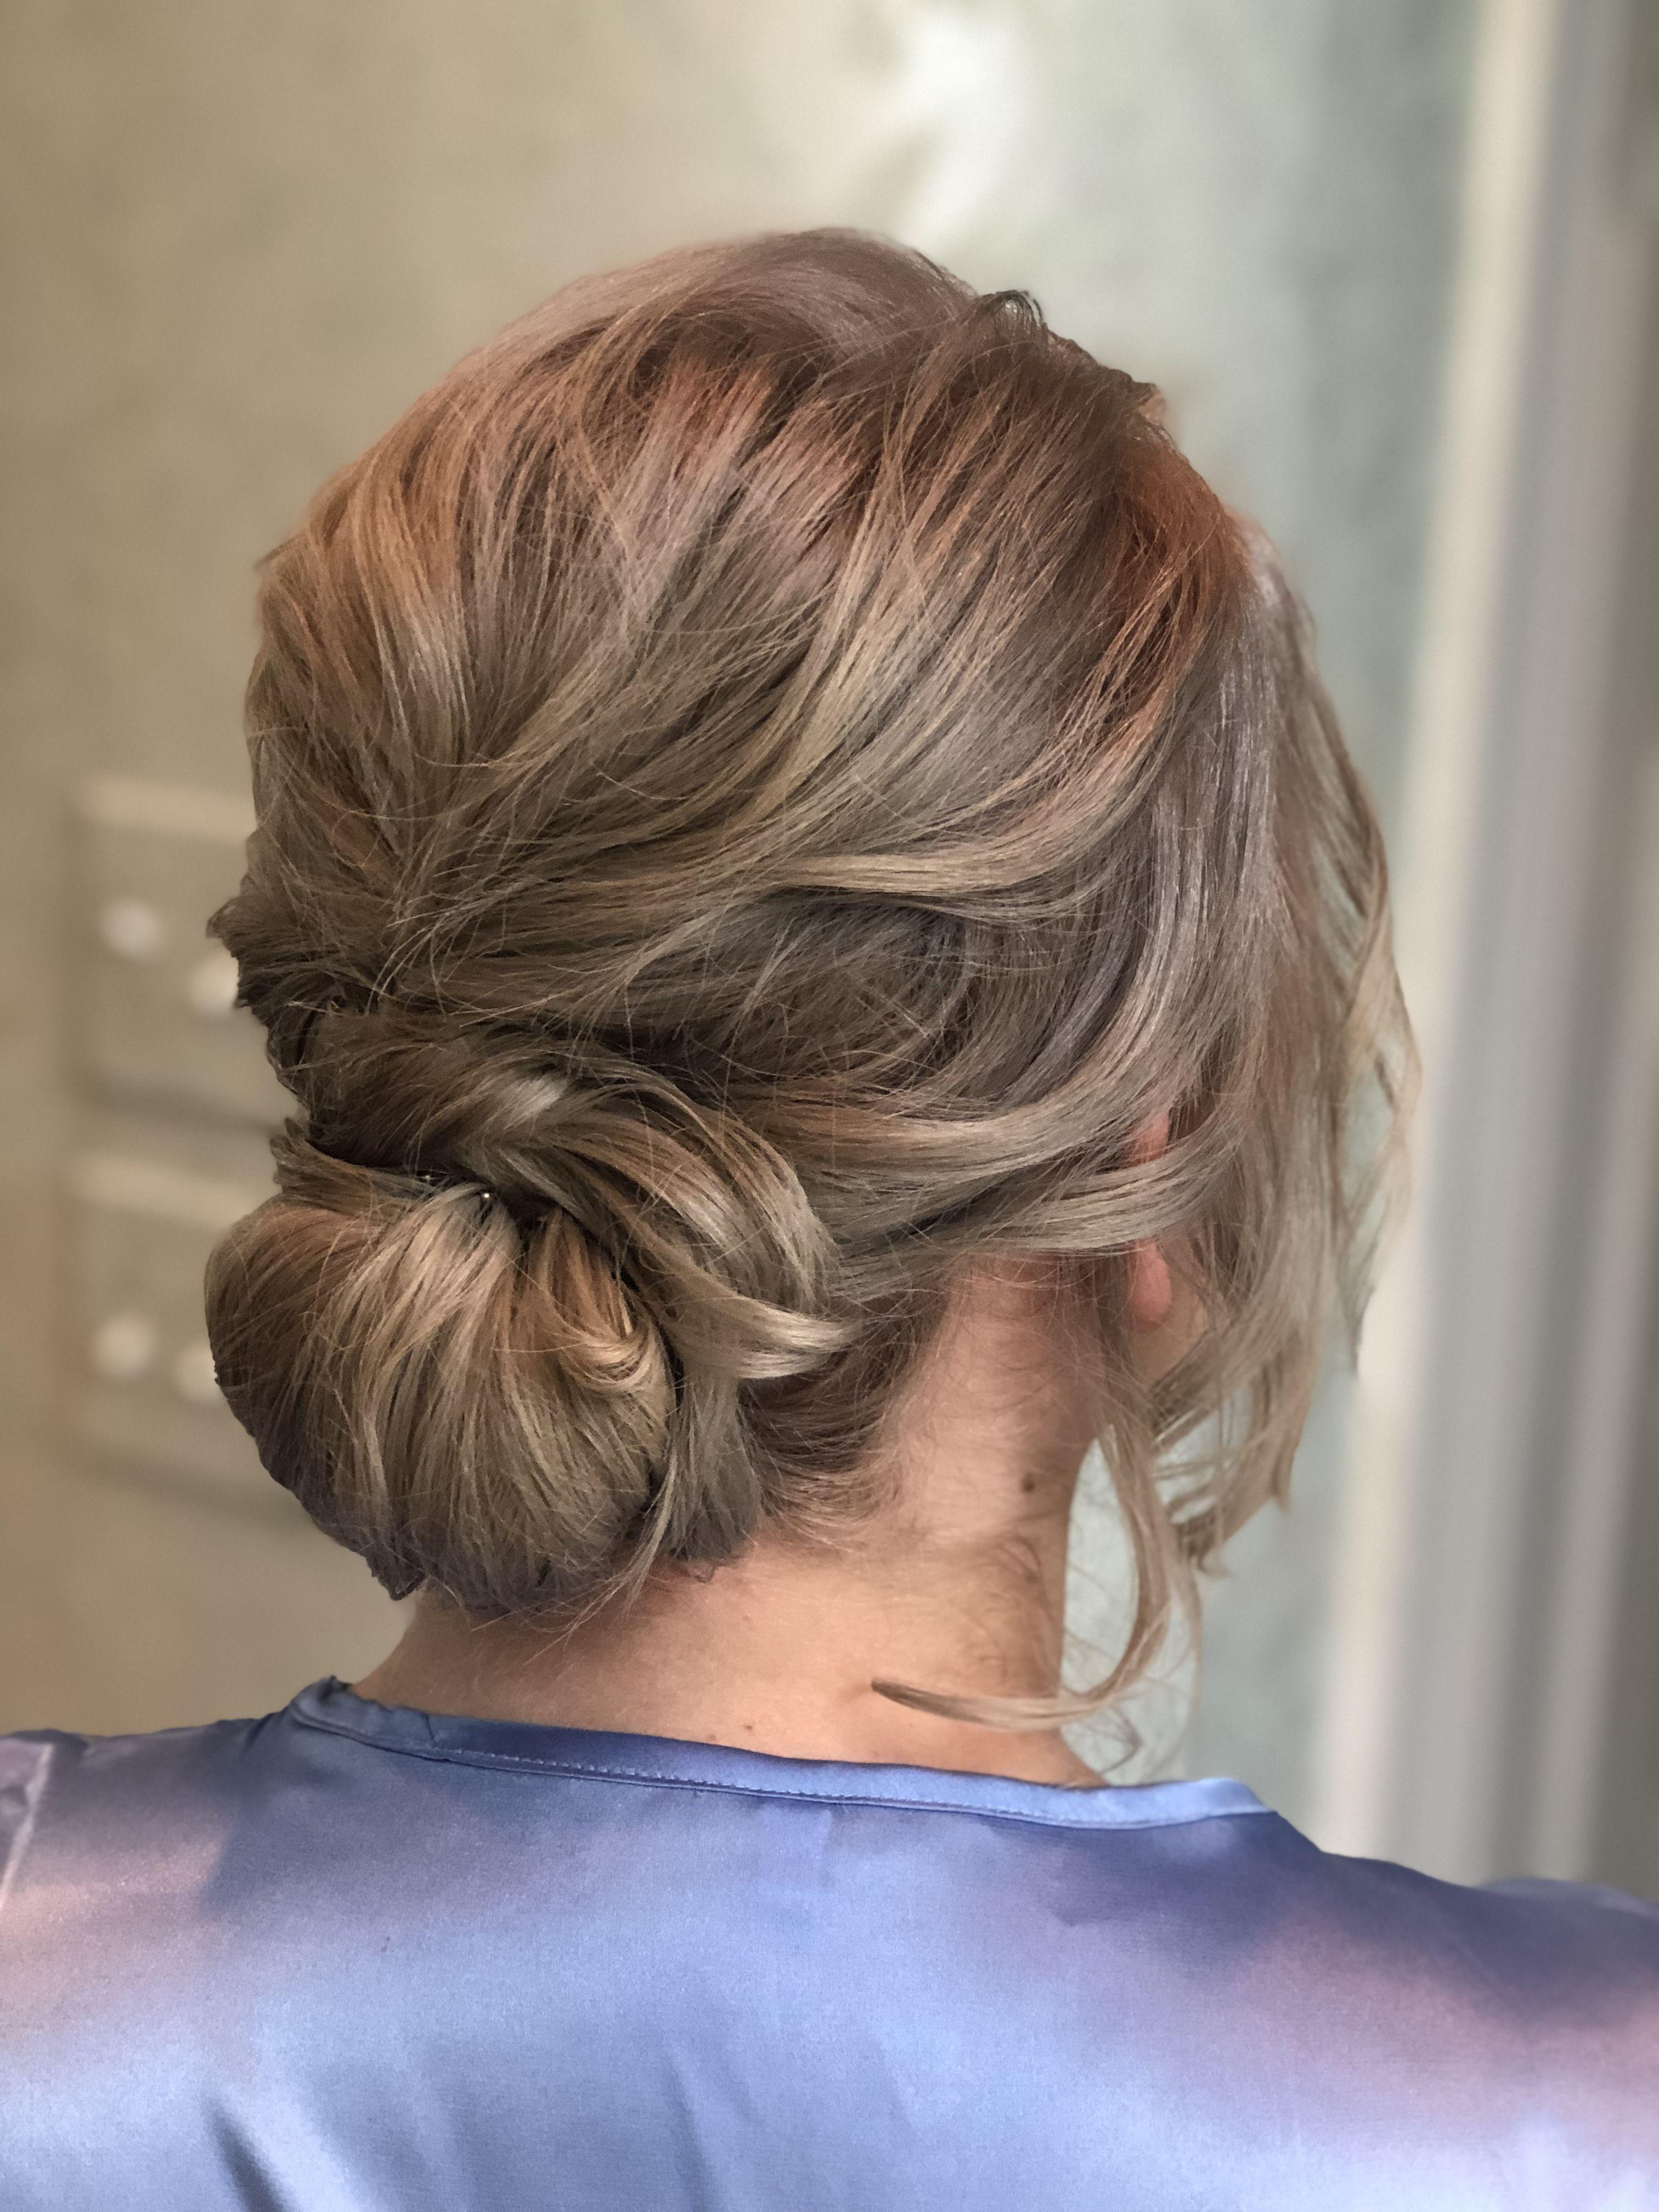 low chignon twisted bun casual updo fine hair updo silver